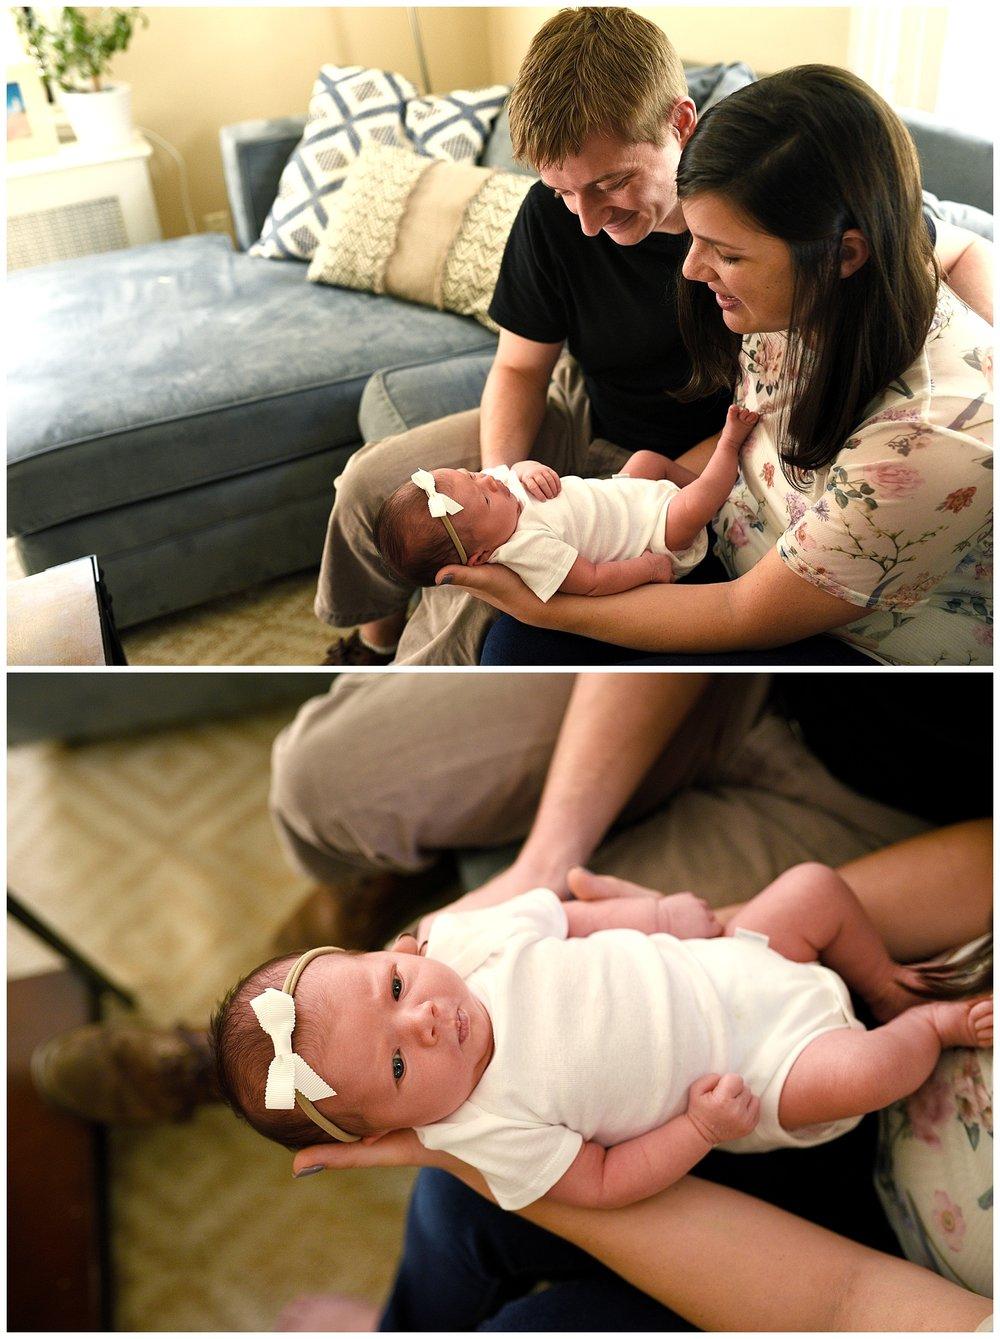 connecticut newborn photographer. hamden, ct newborn photography